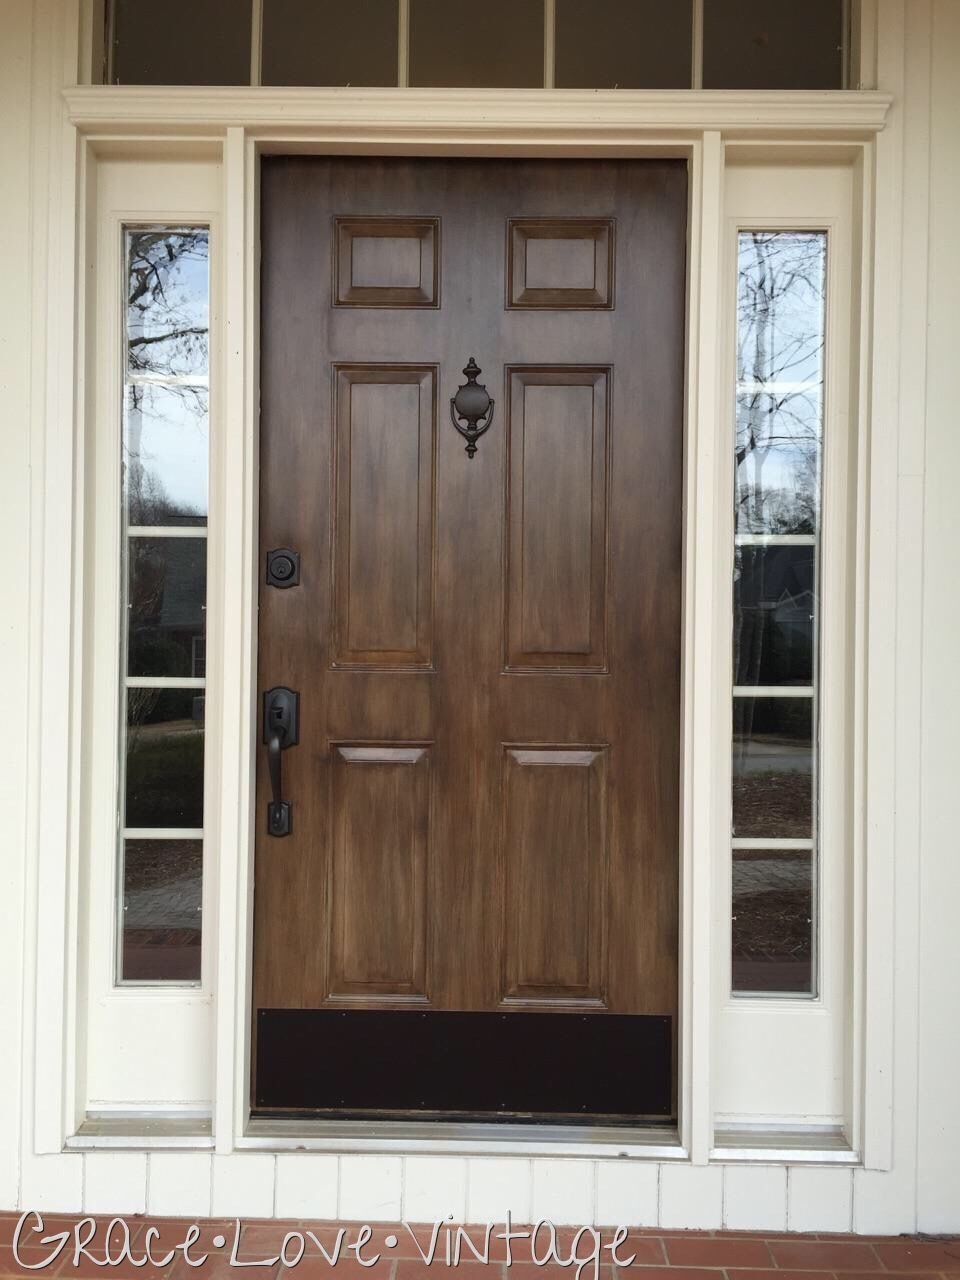 Metal Door Transformation Cali Taupe Covered With Layers Of Jet Black And Chestnut Glaze To Give Metal Doors Exterior Wood Exterior Door Painting Metal Doors